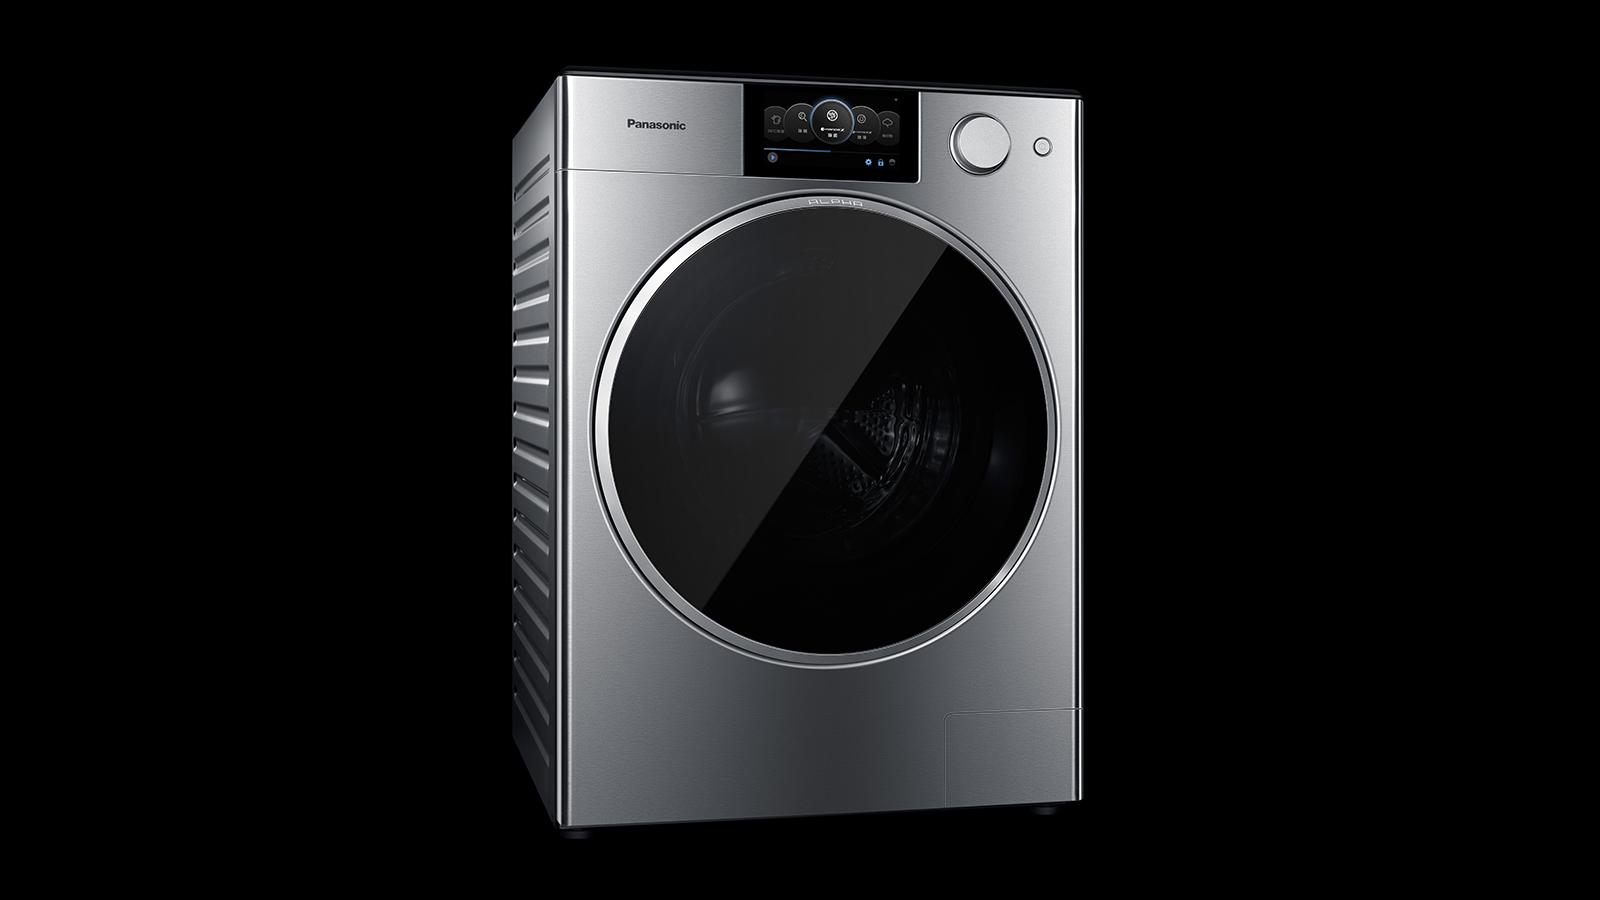 Panasonic-ALPHA-Washing-Machine-Frontloader